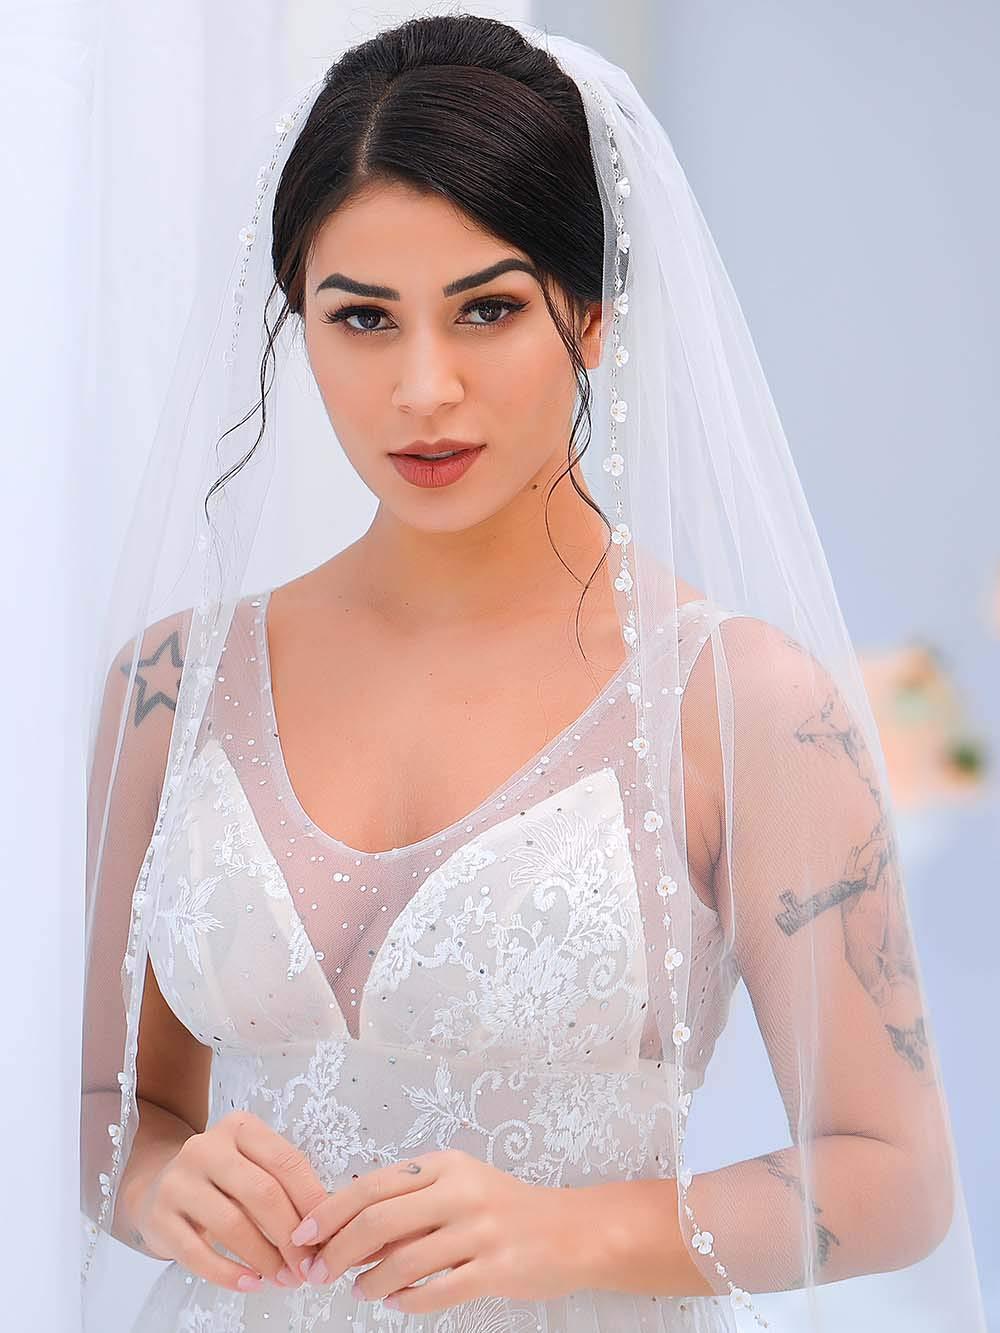 298v Bridal White Tulle Loop Floral Design w Pearls Wedding Veil w Comb